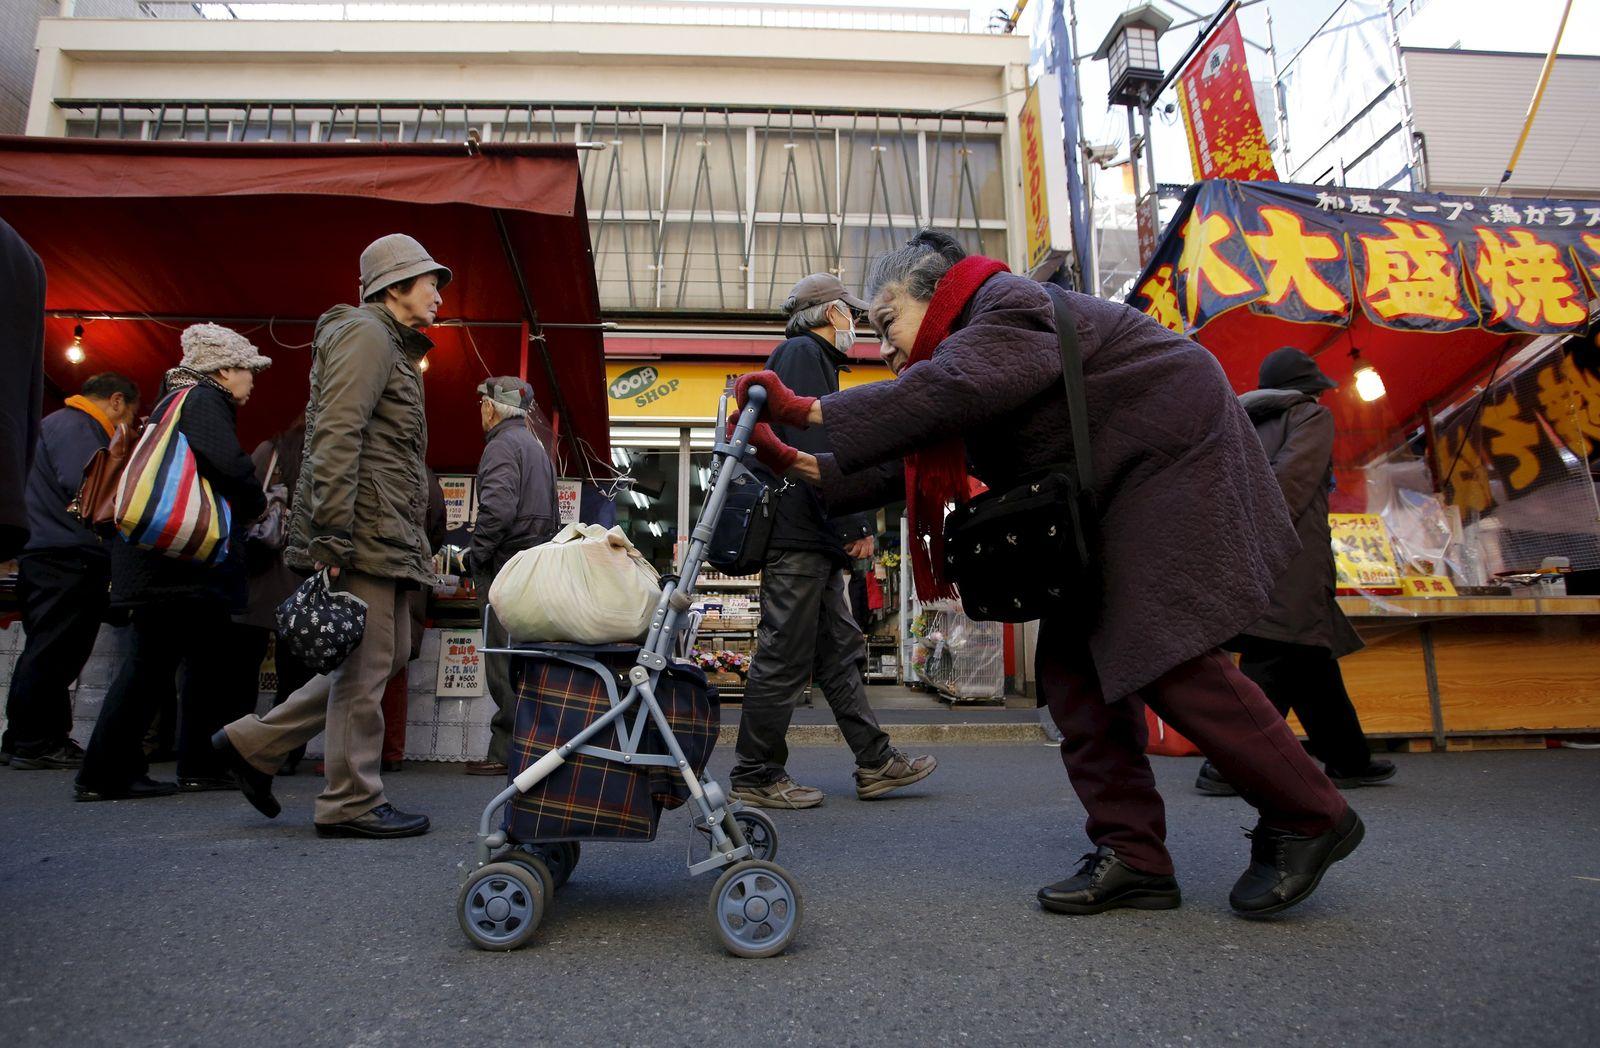 Japan/ Abenomics